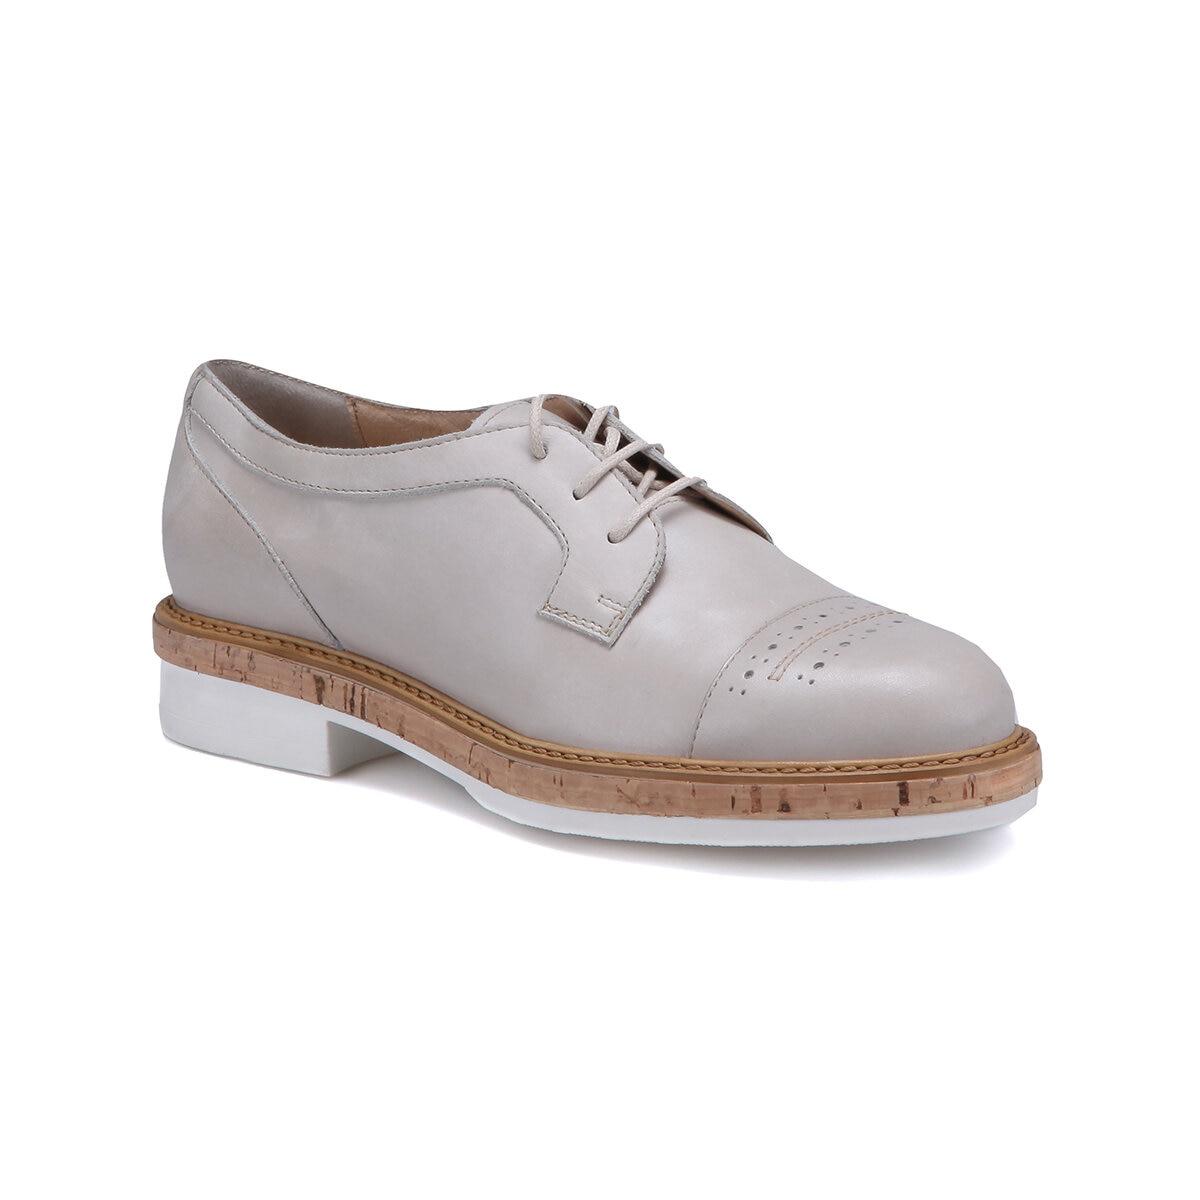 FLO 171M2202MX Beige Women 'S Sneaker Shoes BUTIGO